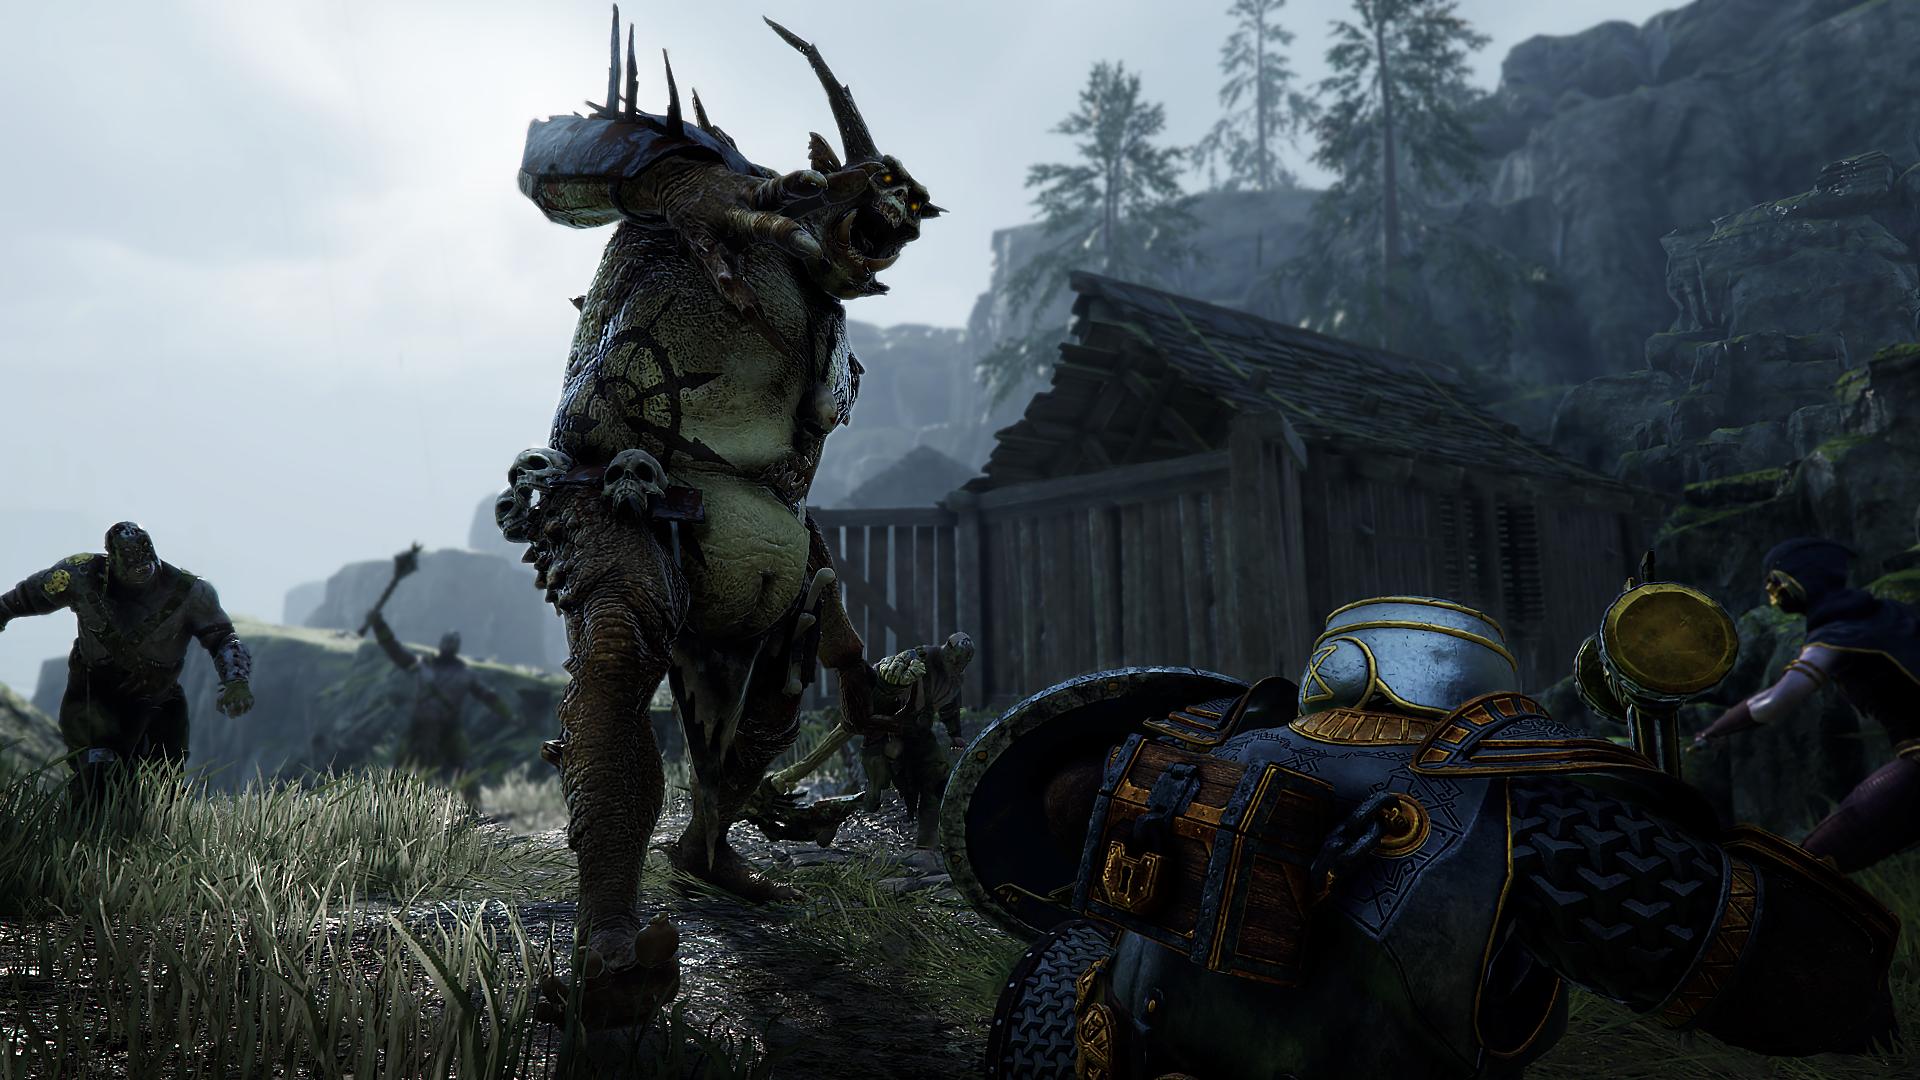 Fatshark on Warhammer Vermintide 2 - DX12 Support, Improved Combat